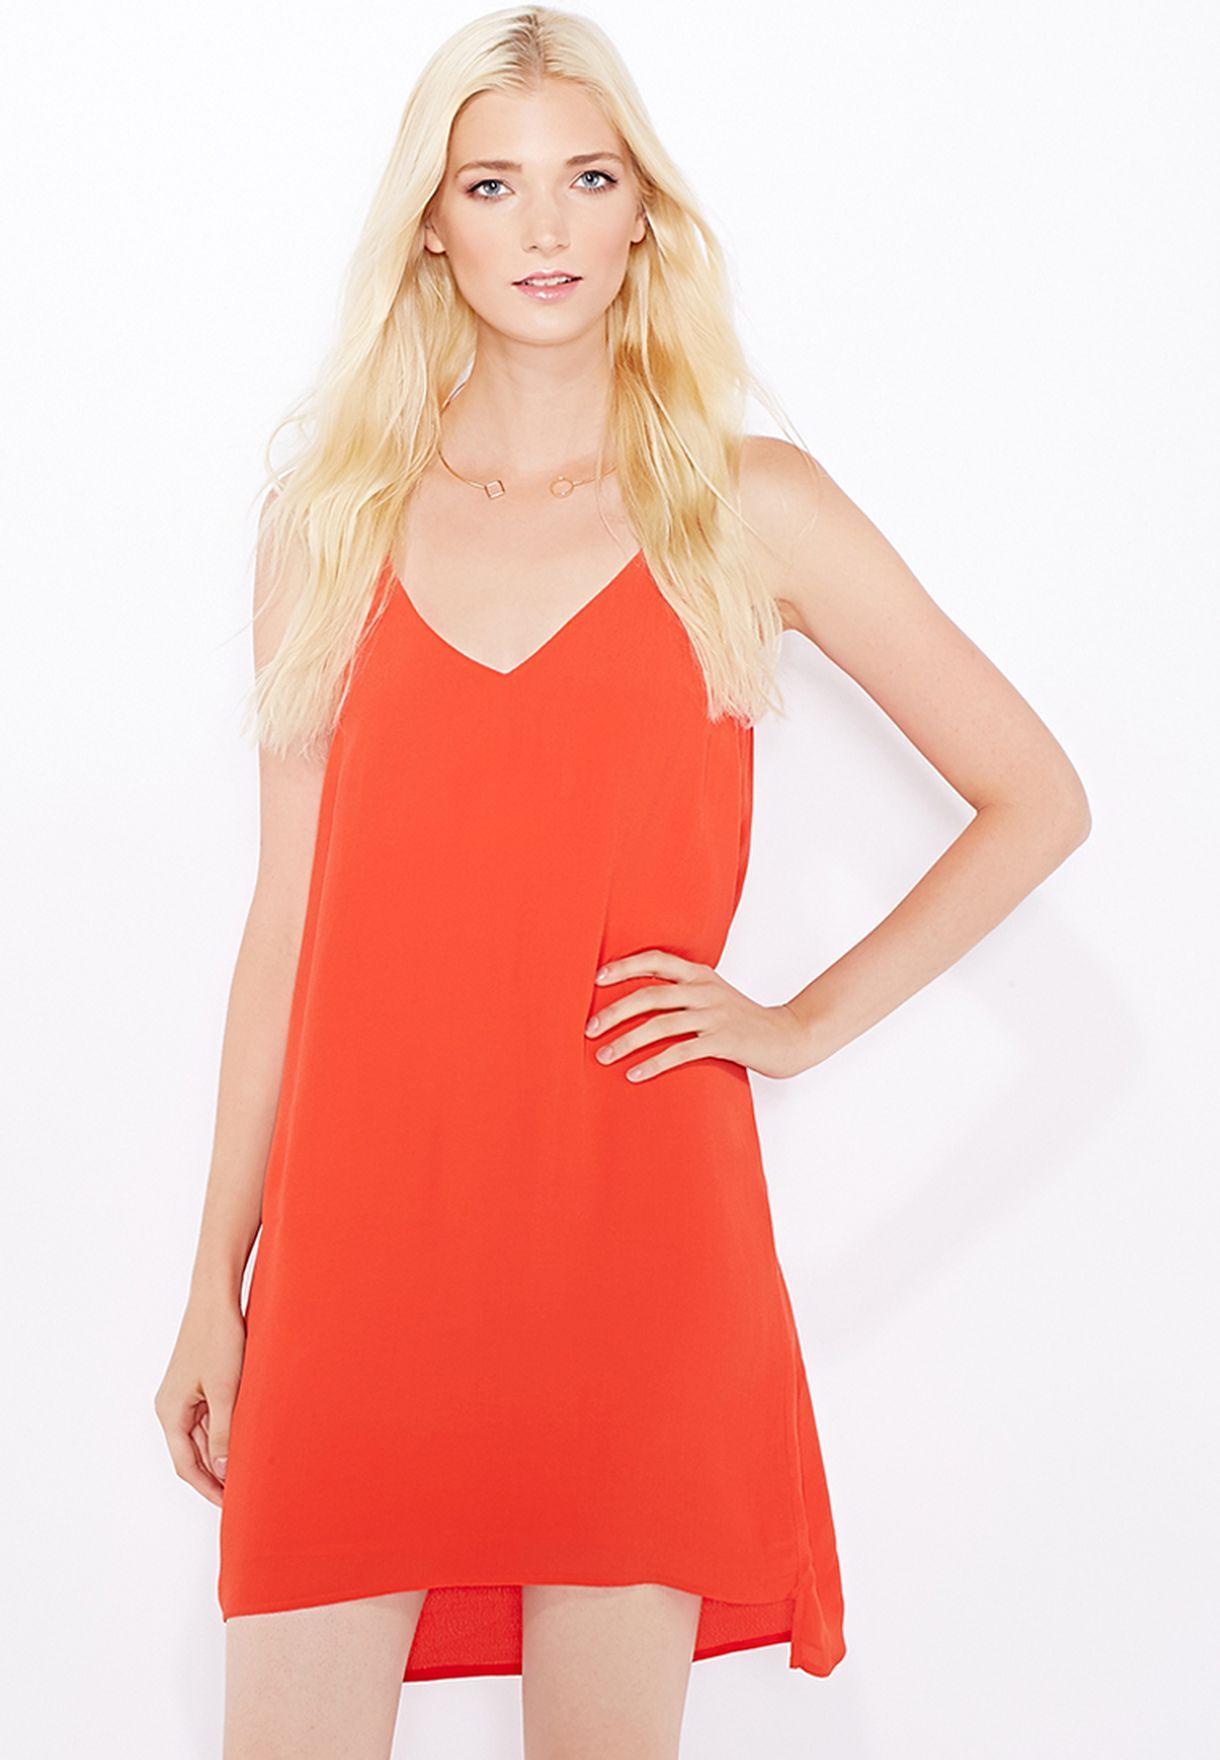 3b56c0197b74 Shop Topshop red High Apex Slip Dress 10K05HTOM for Women in Qatar ...